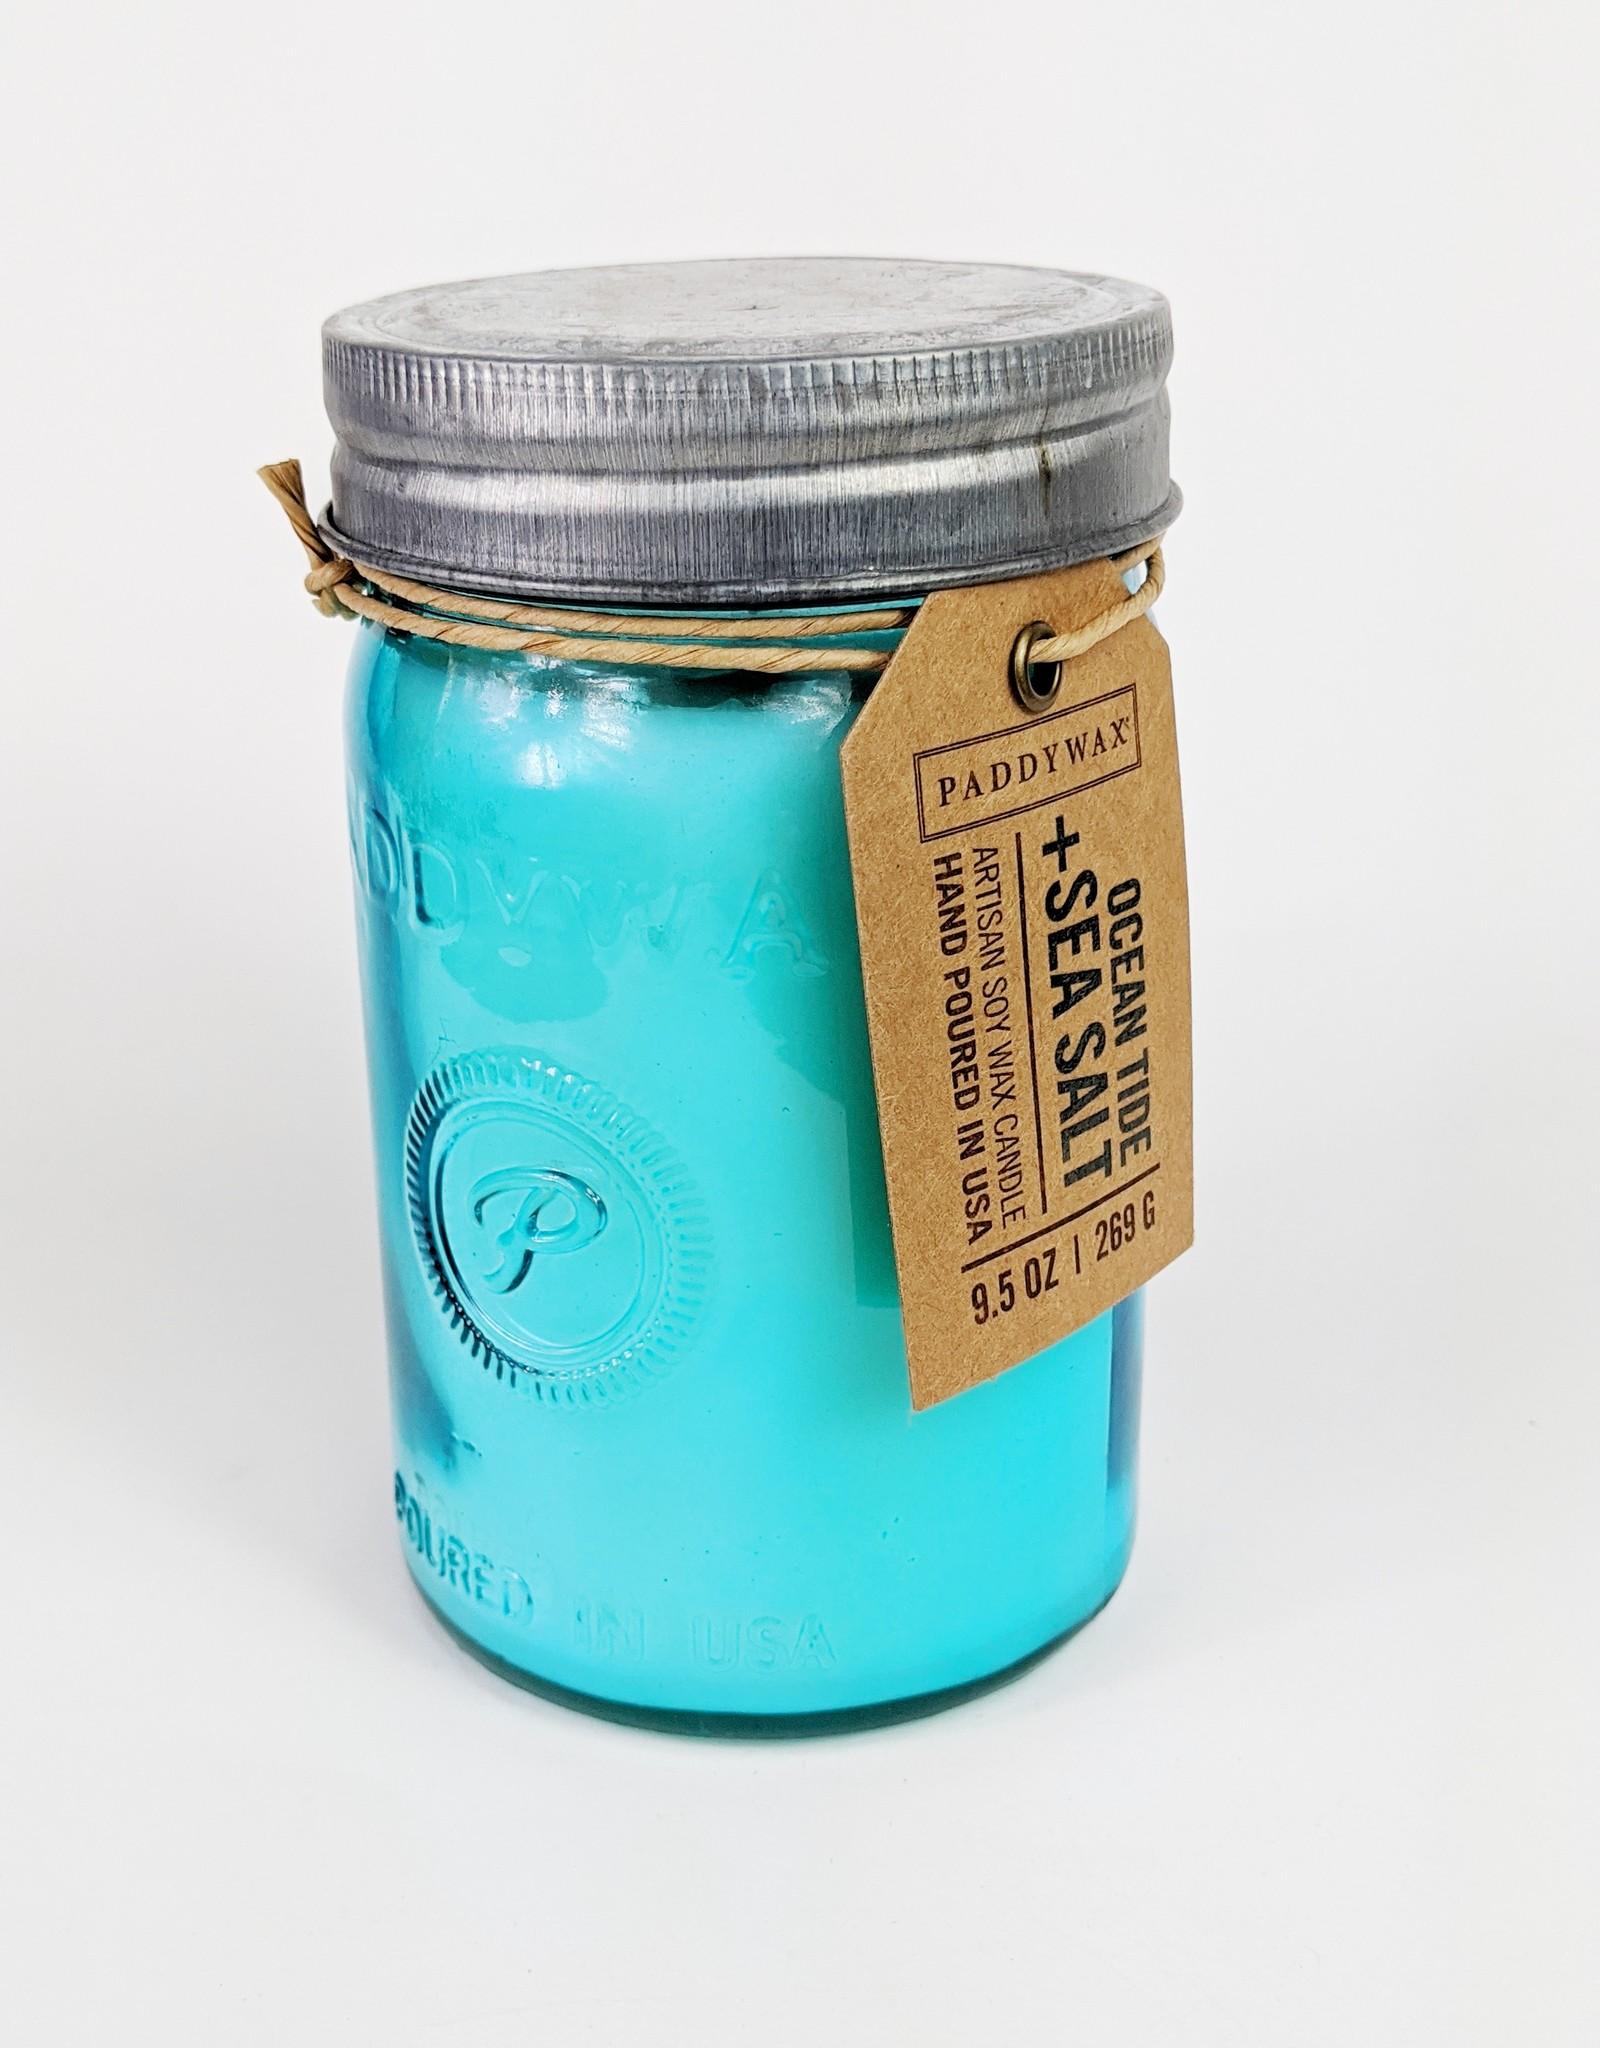 Relish Jar Candle 9.5oz